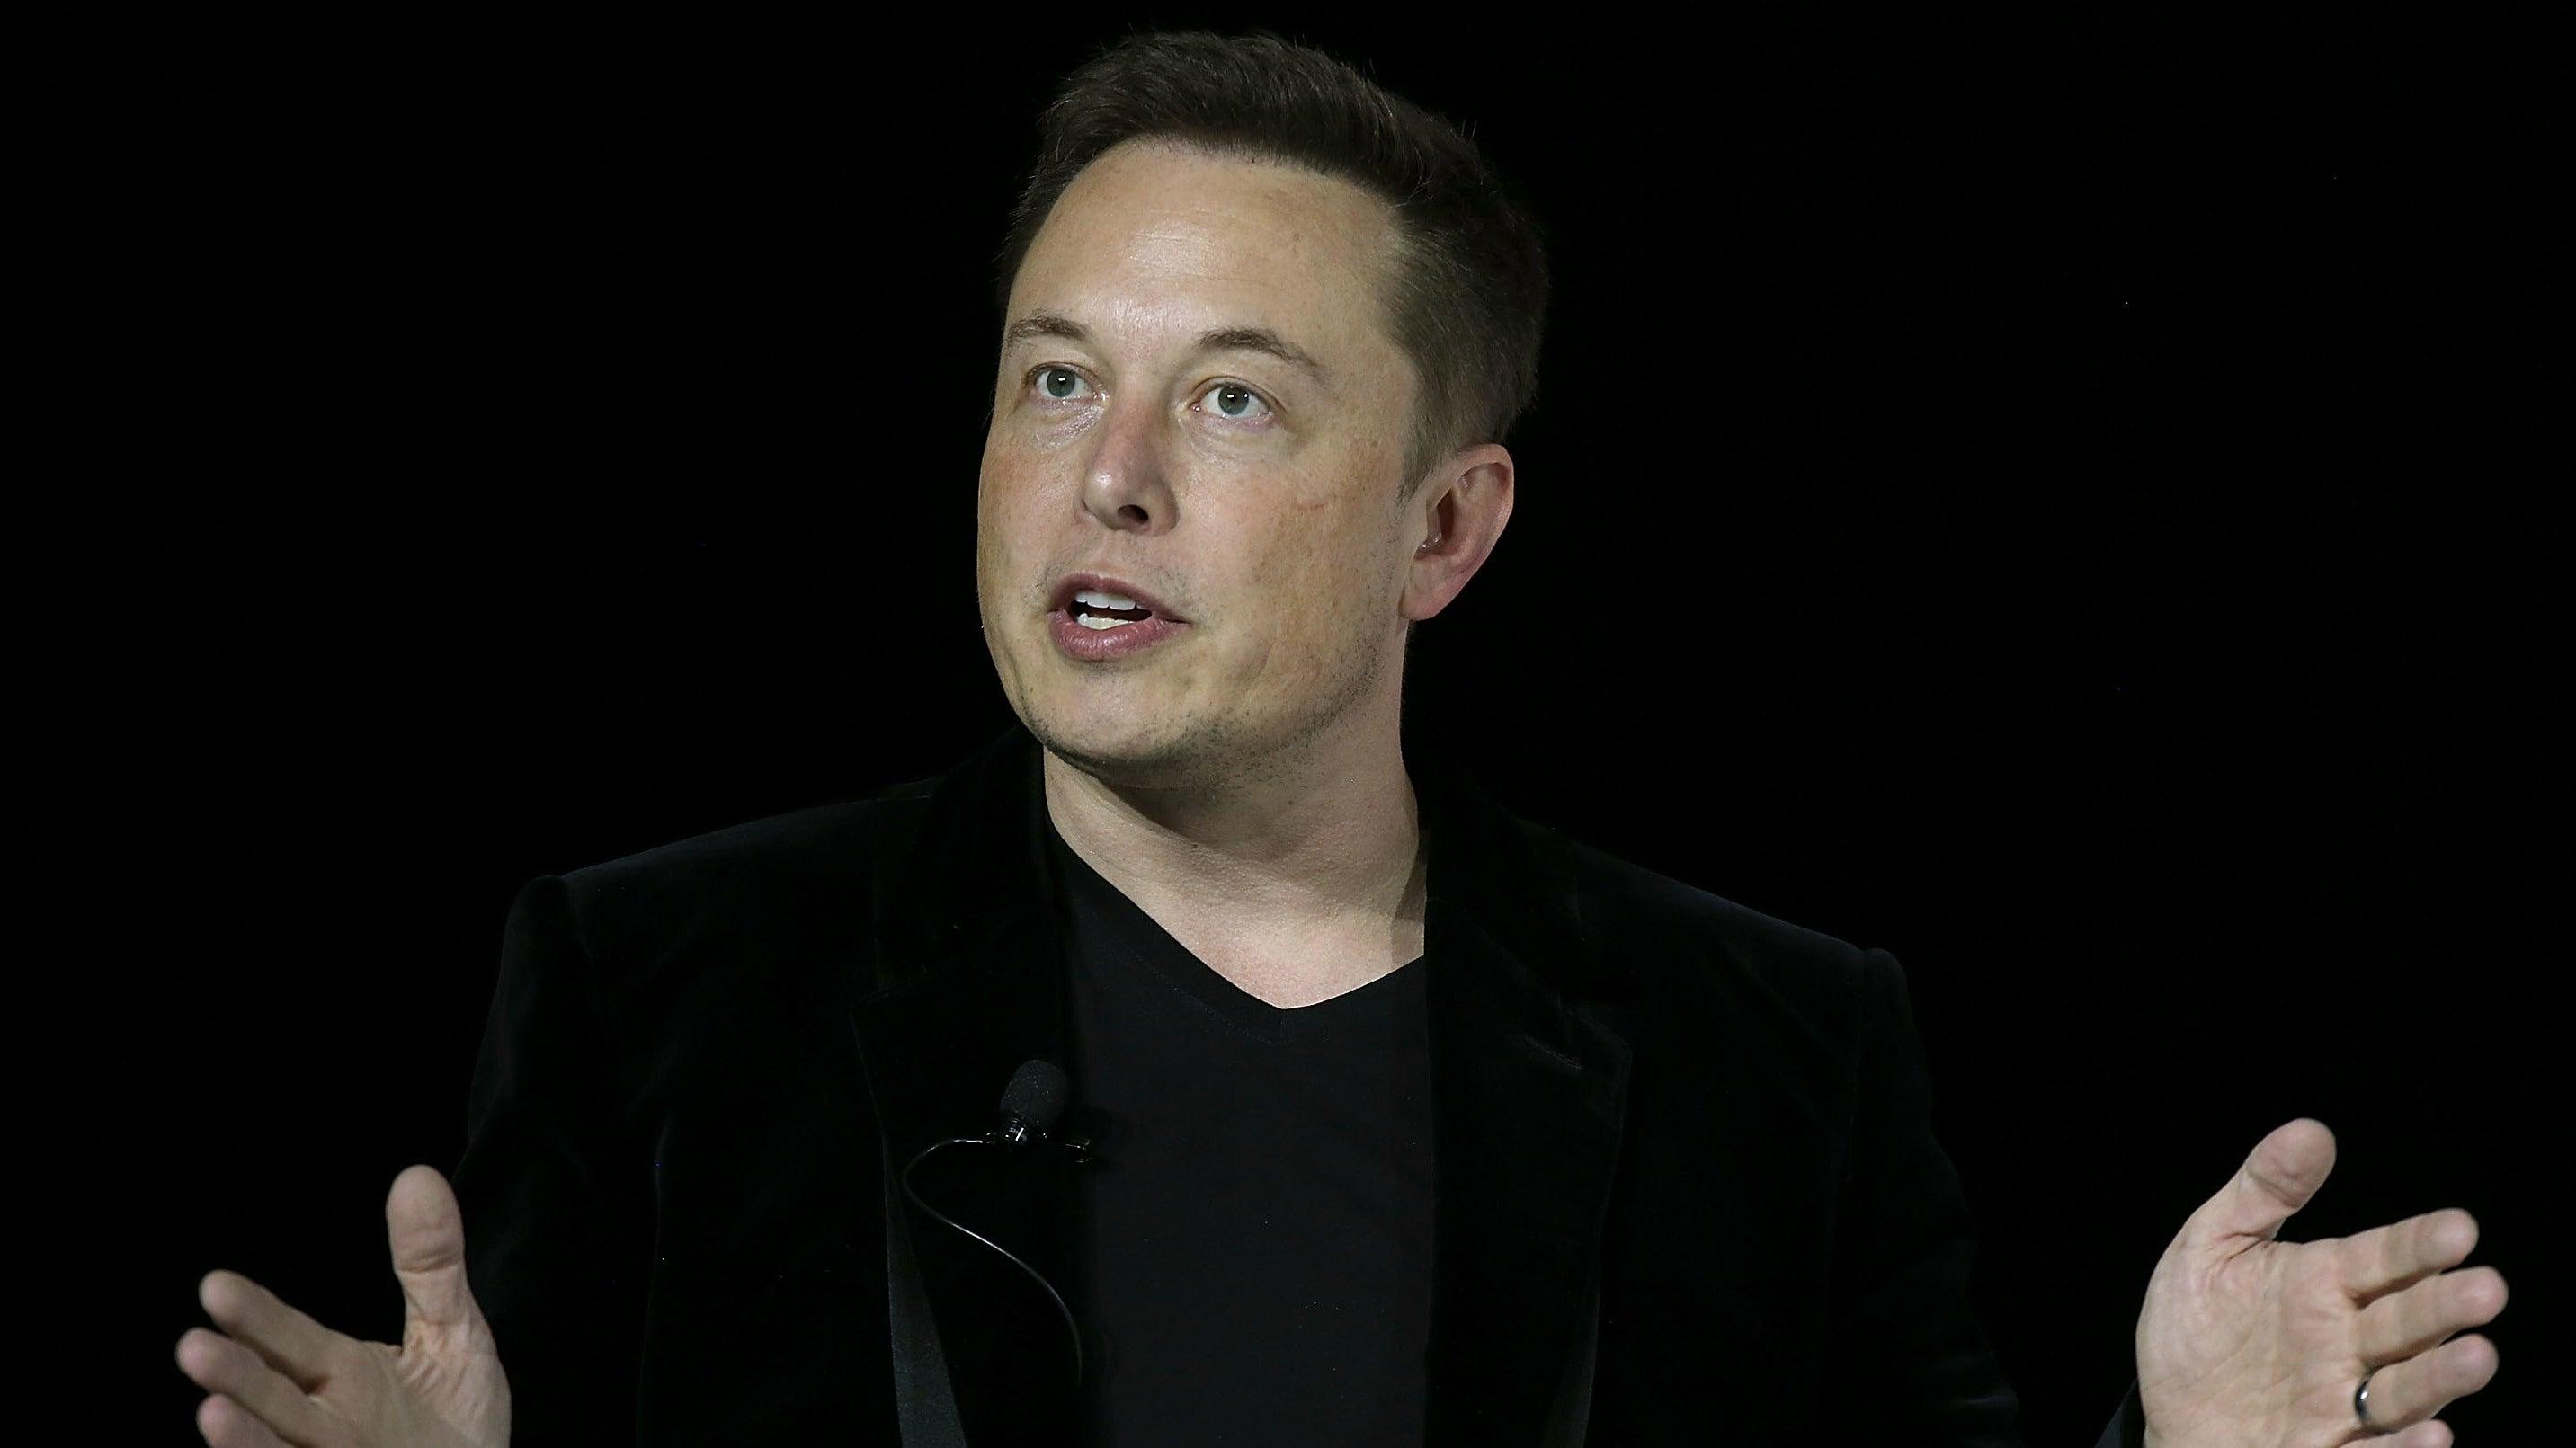 Elon Musk Should Tweet More